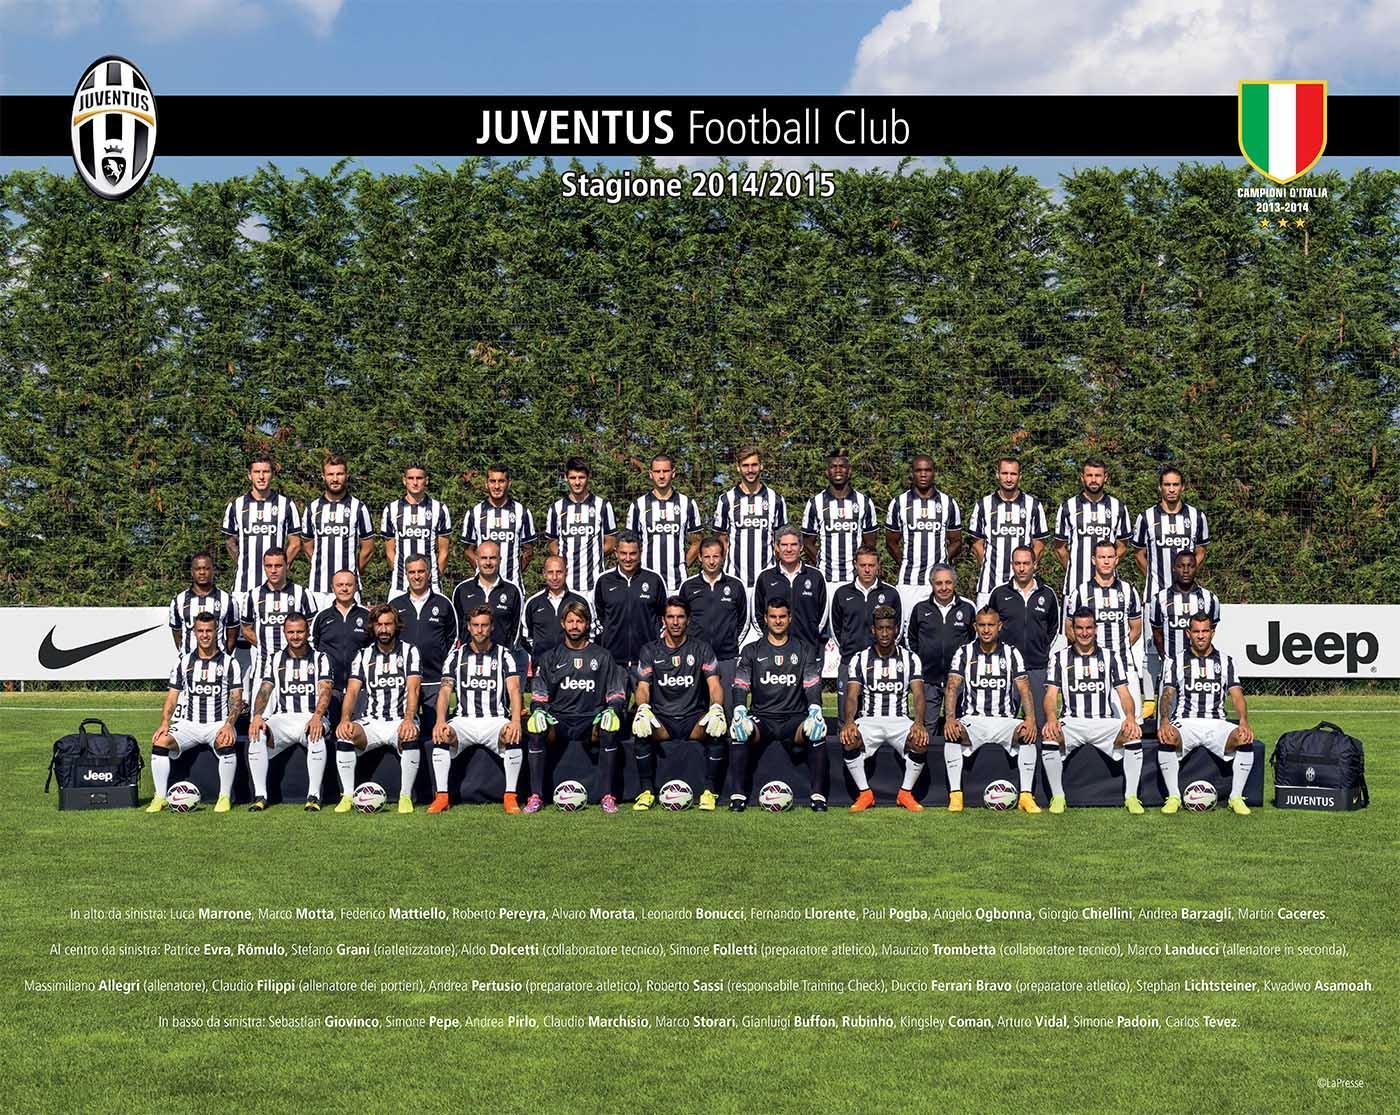 Sassuolo V Juventus: Watch Live Stream Of The Serie